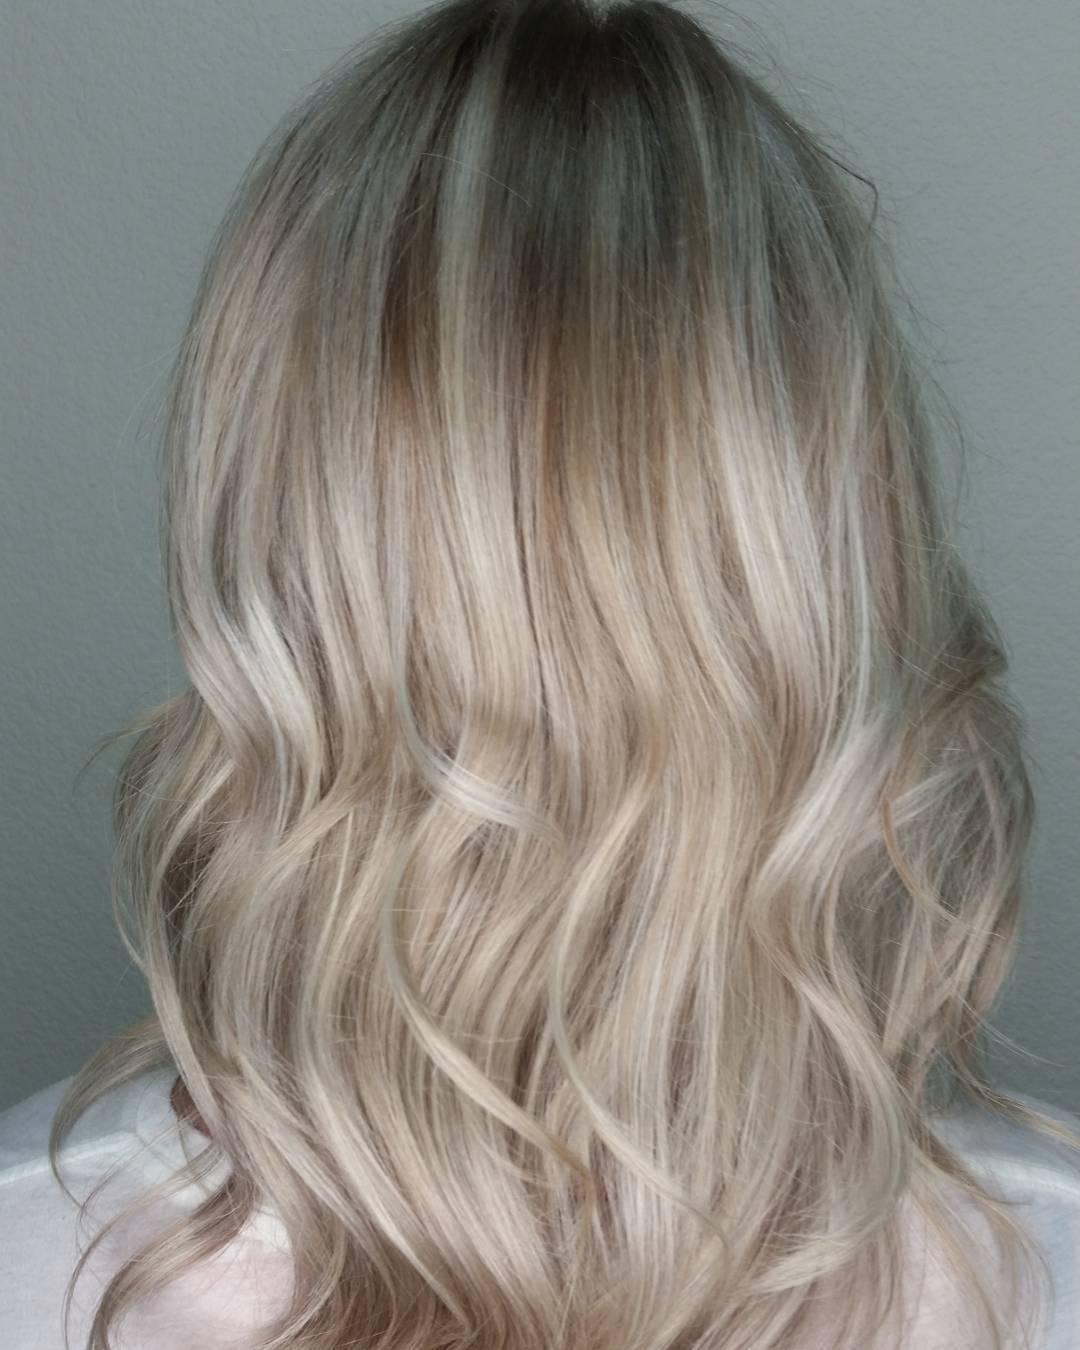 Olga Demskaya Las Vegas Hair 6.jpg